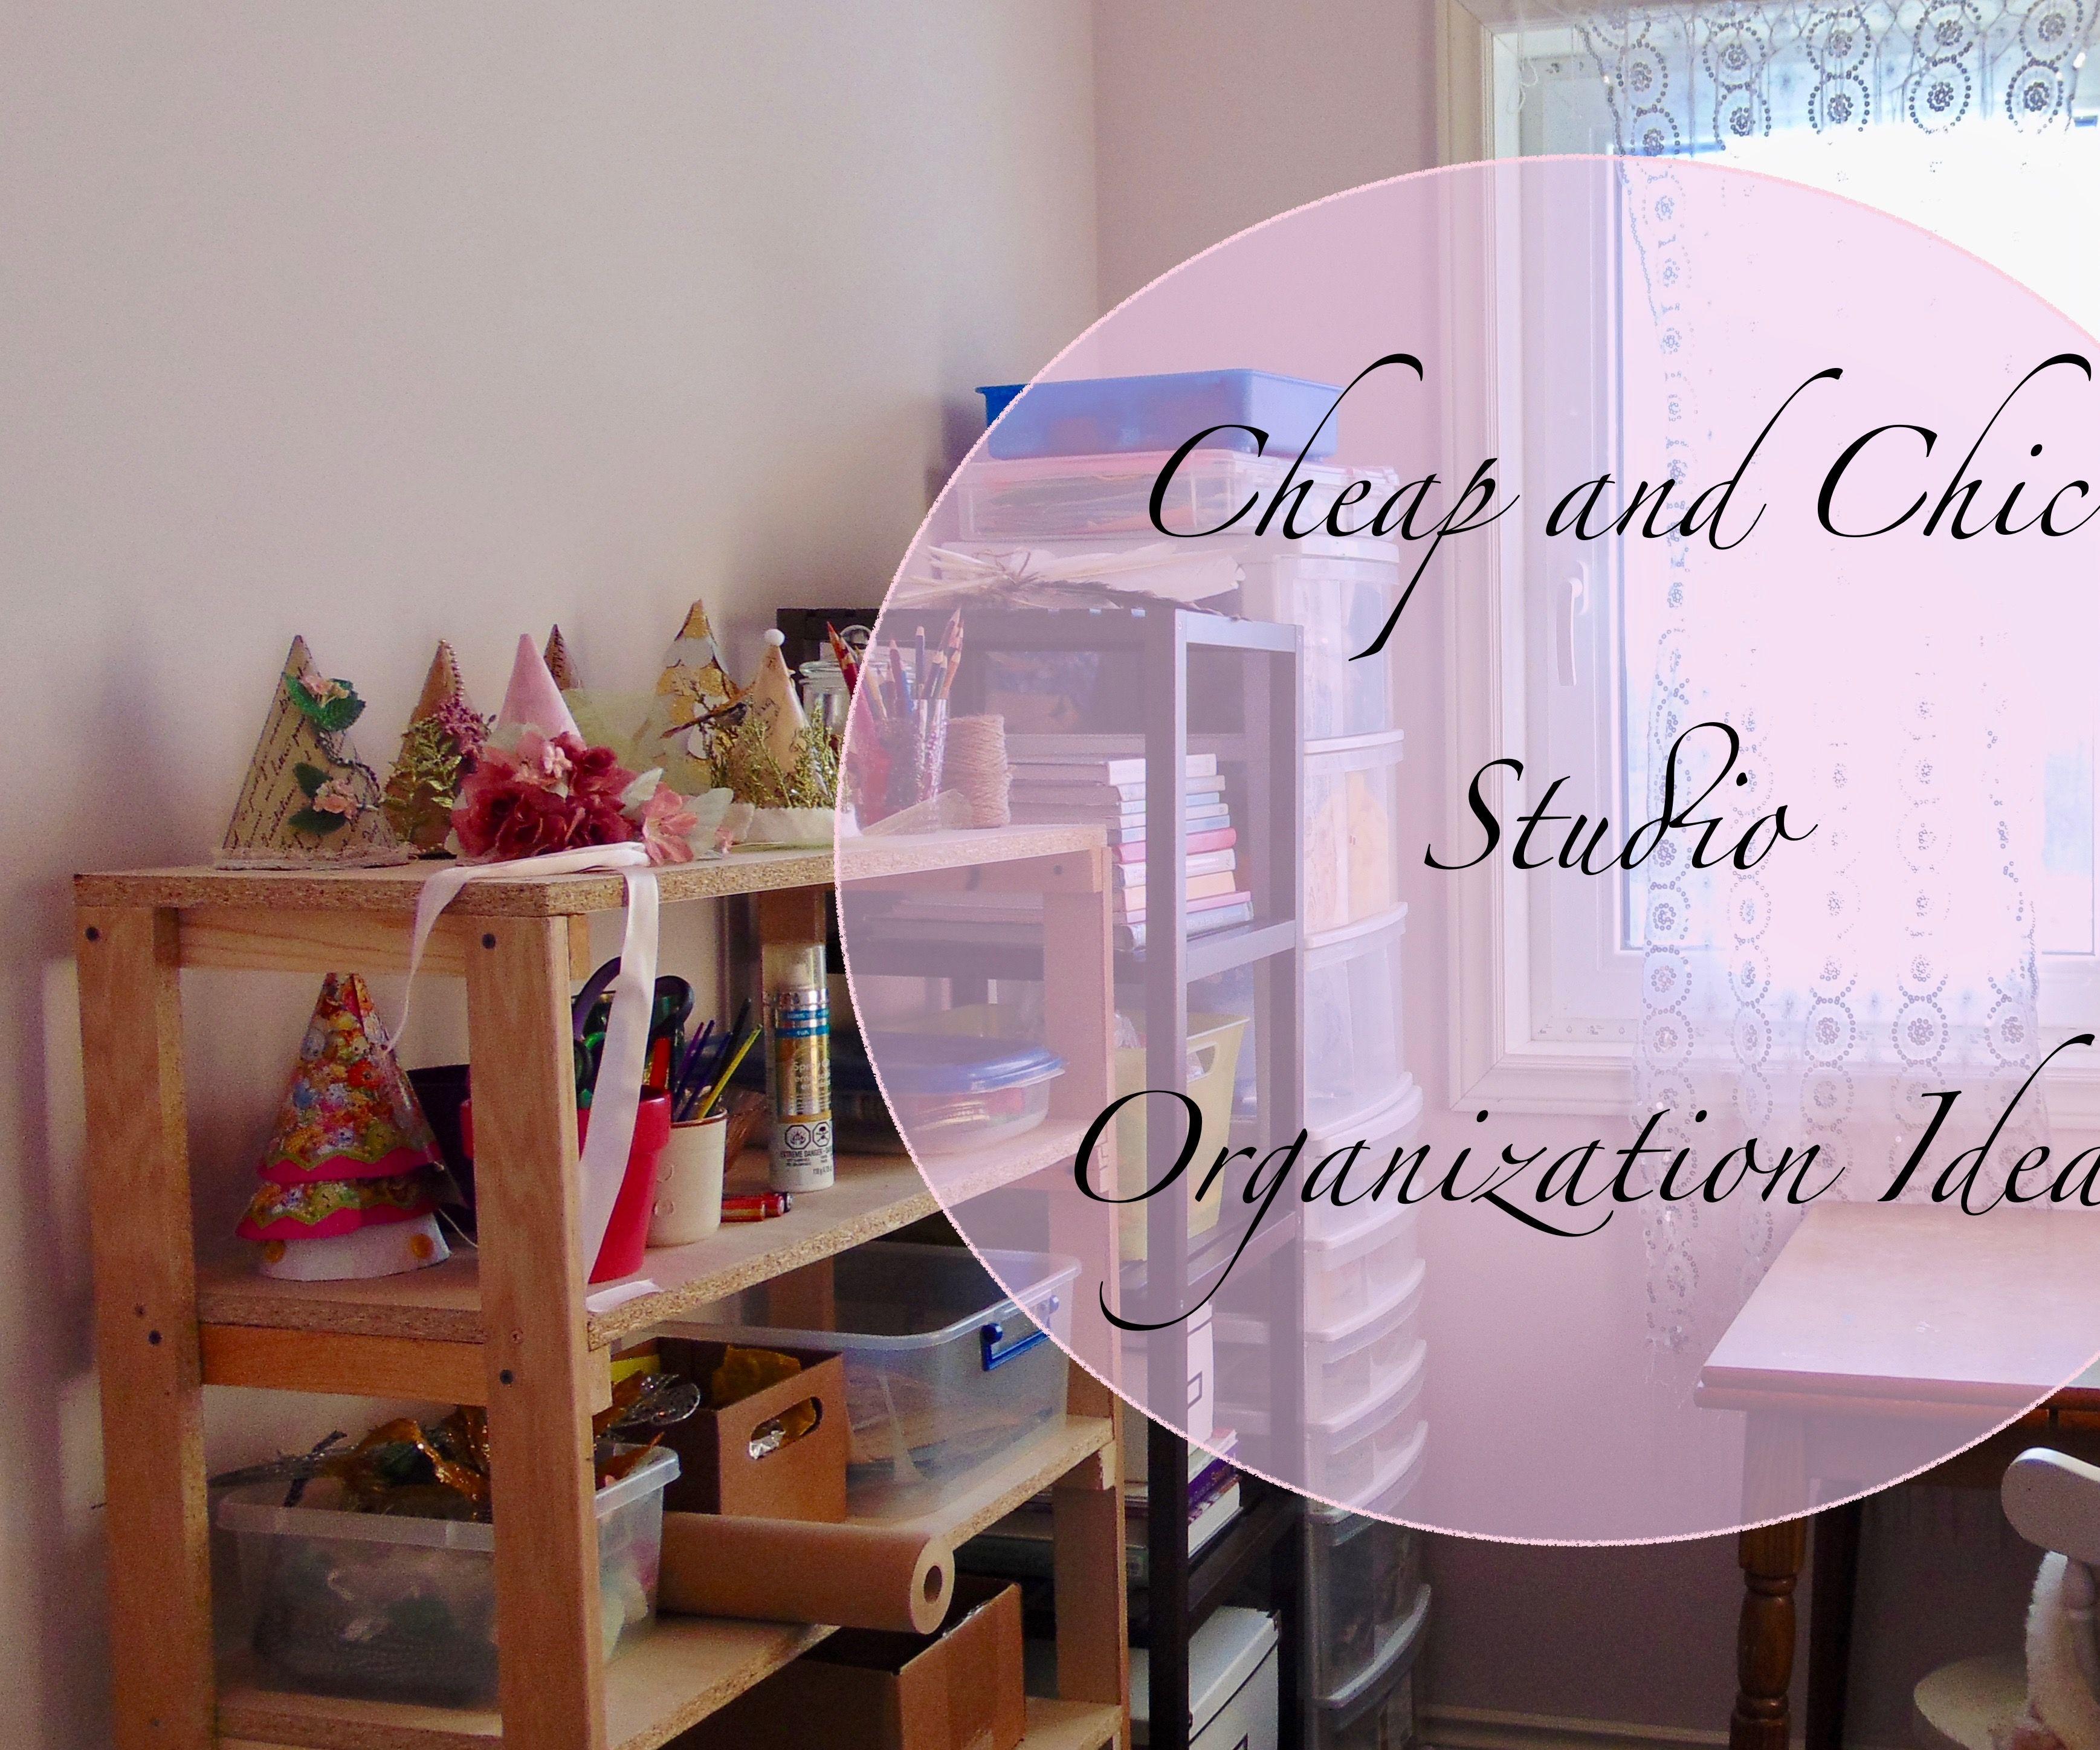 Cheap and Chic Studio Organization Ideas